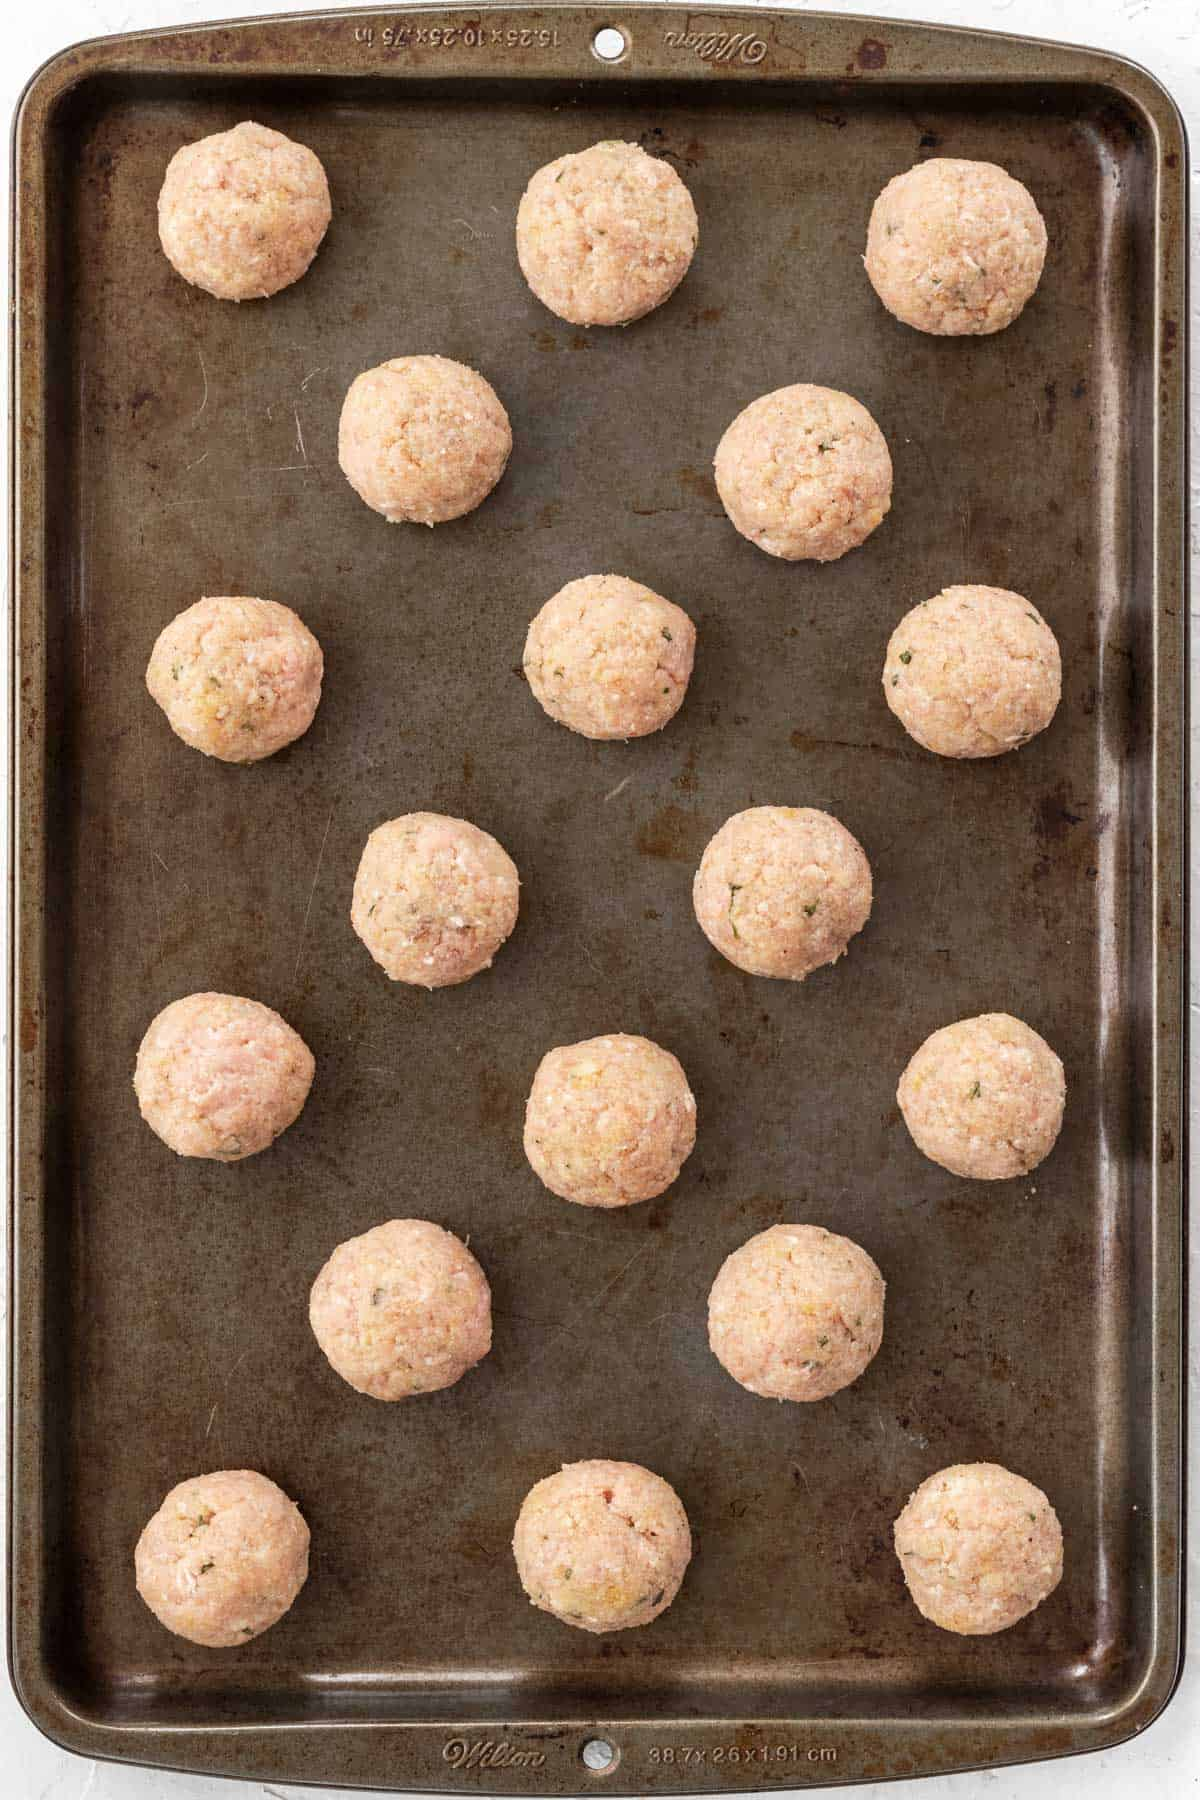 Raw meatballs on a baking sheet.